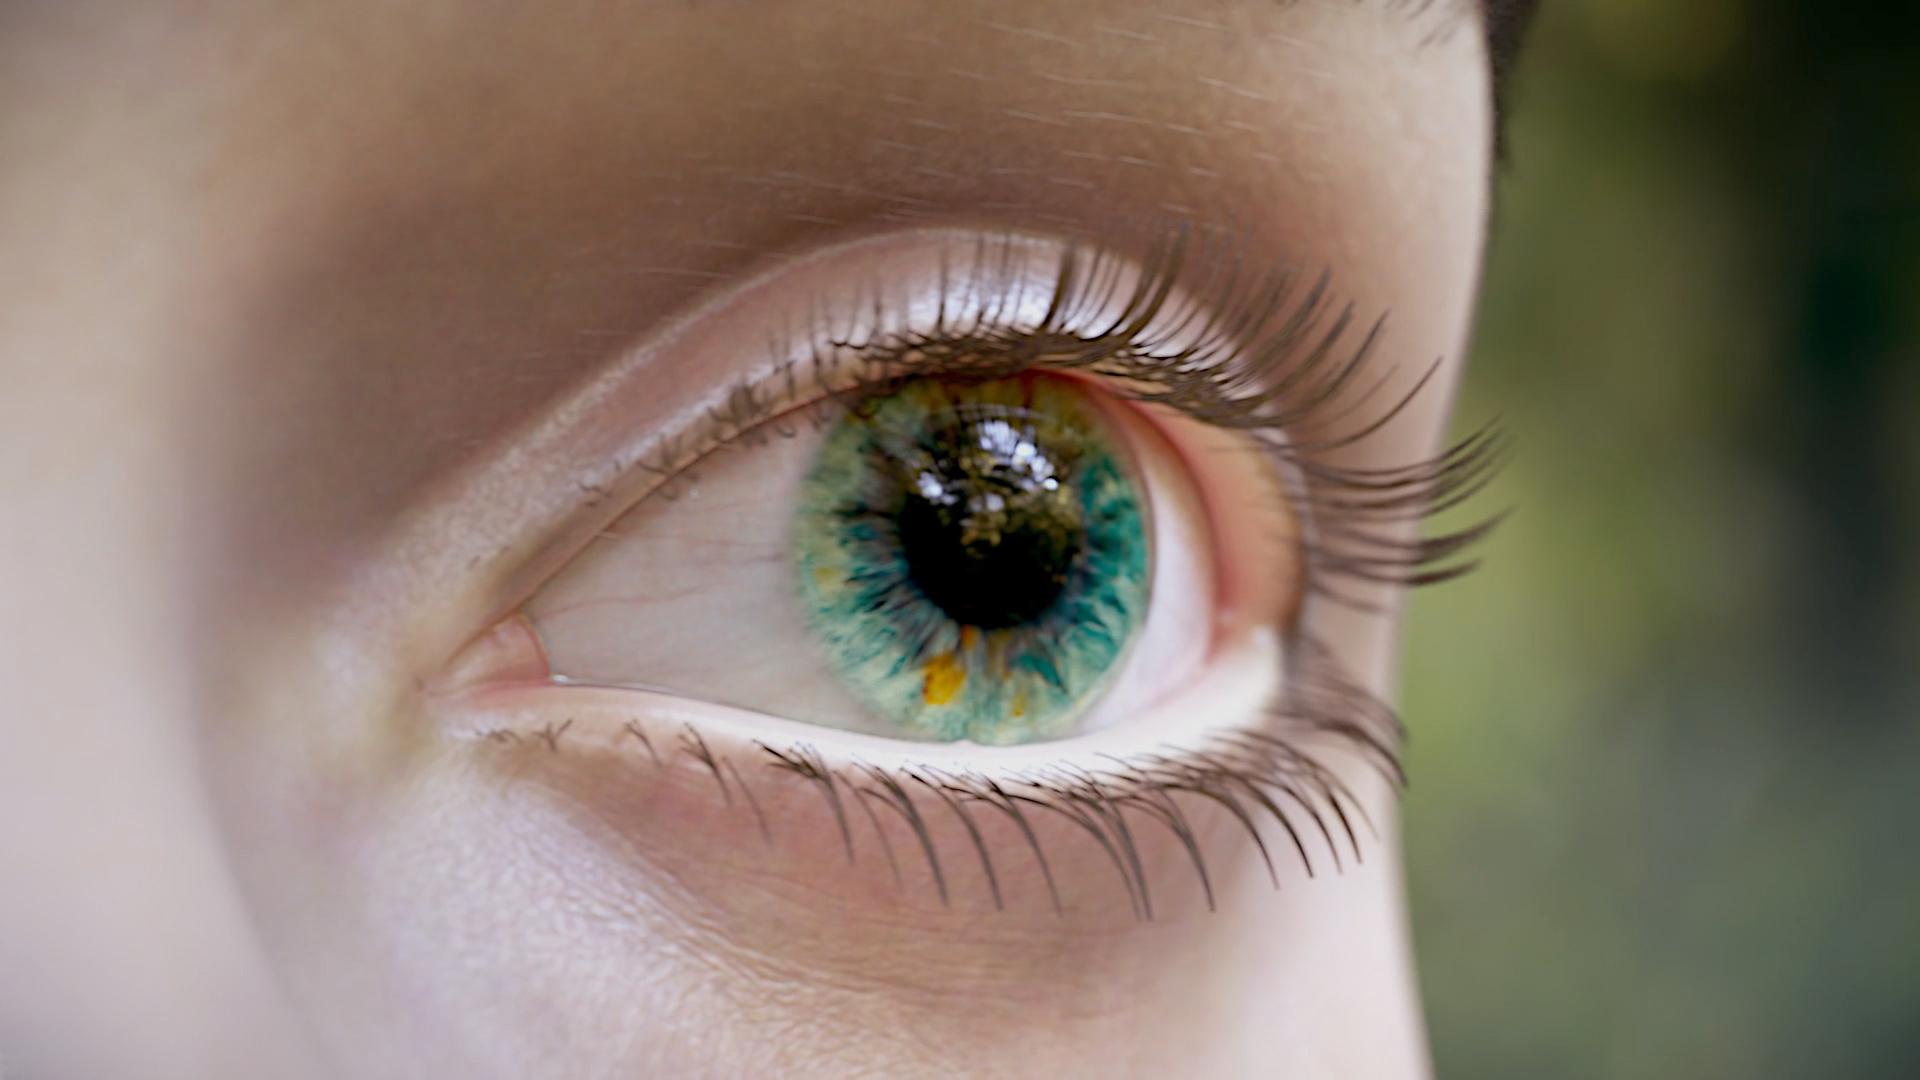 Eye Diabetes Inflammation Mechanism Of Action MoA Image